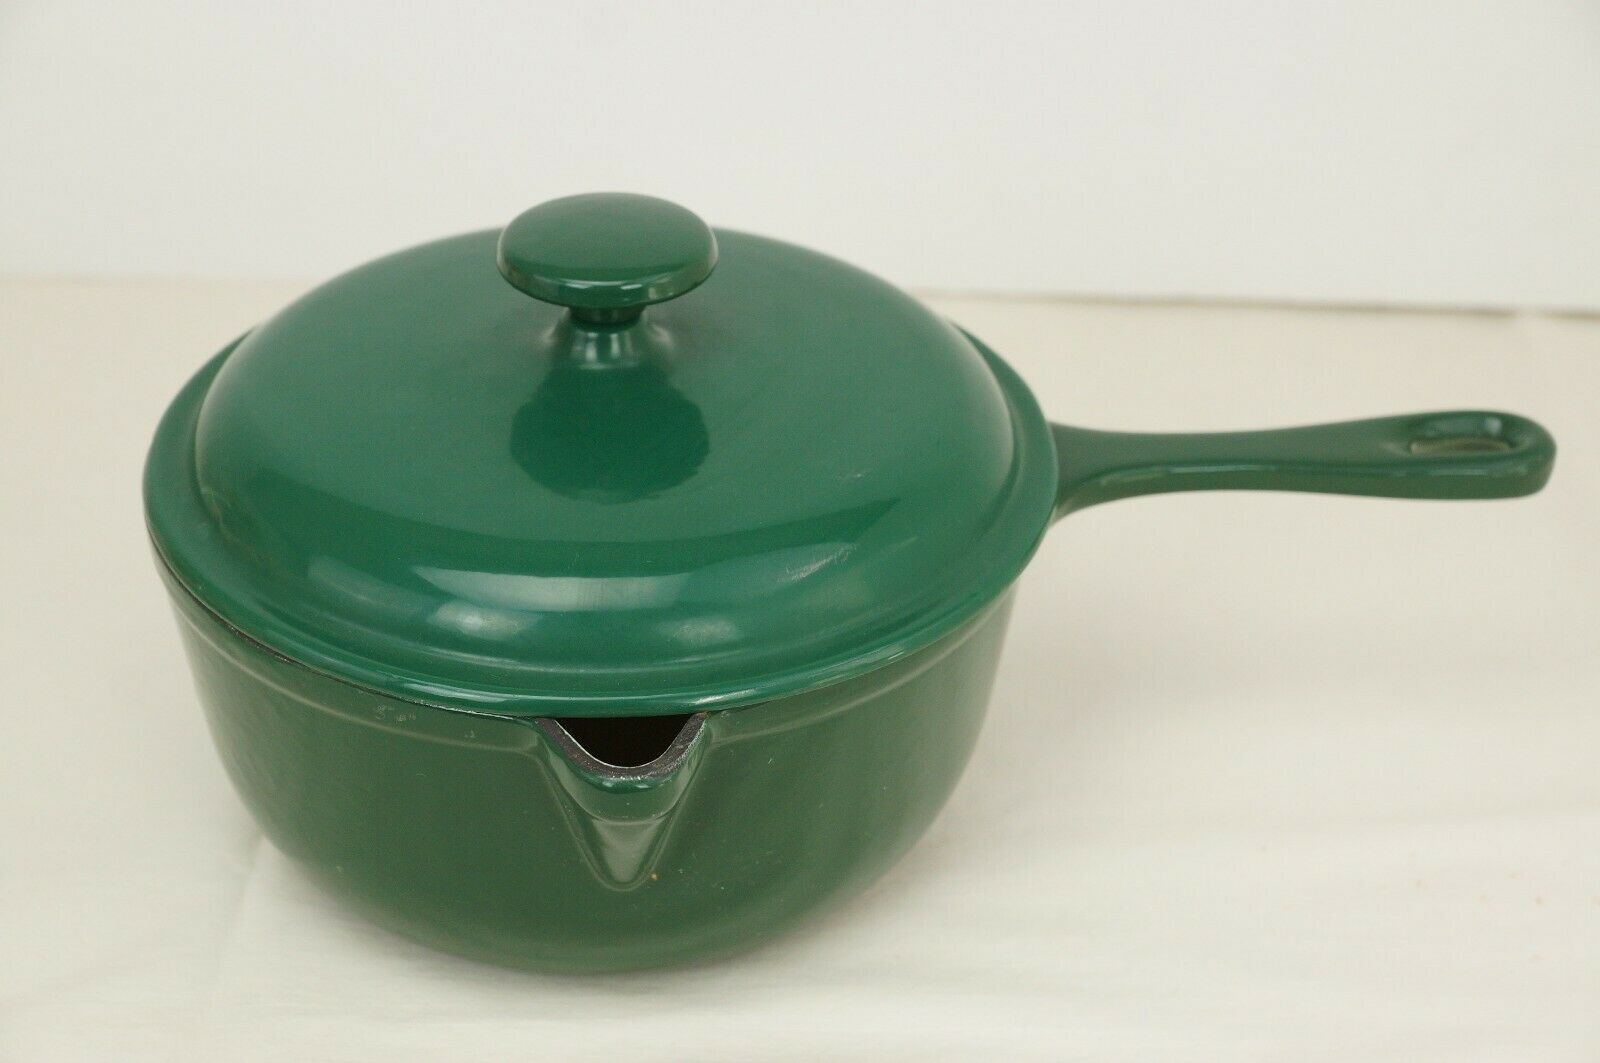 Innova Grün Enameled Cast Iron Saucepan Pot + Lid Lid Lid NEW 7e6167